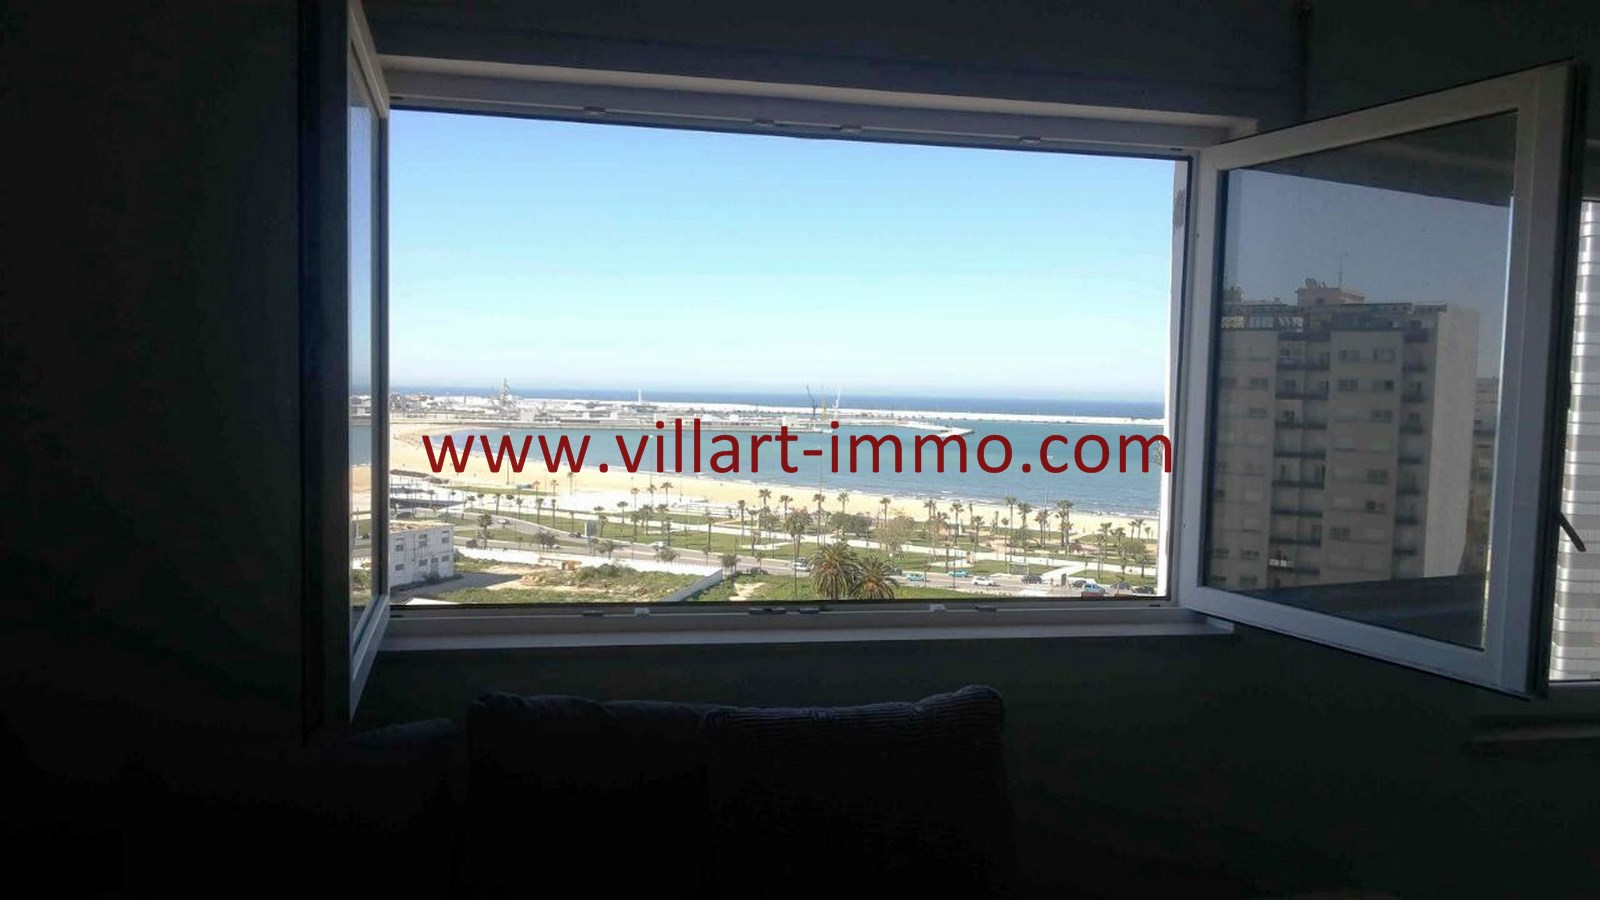 8-Vente-Appartement-Tanger-Malabata-Vue Mer-VA490-Villart Immo (Copier)